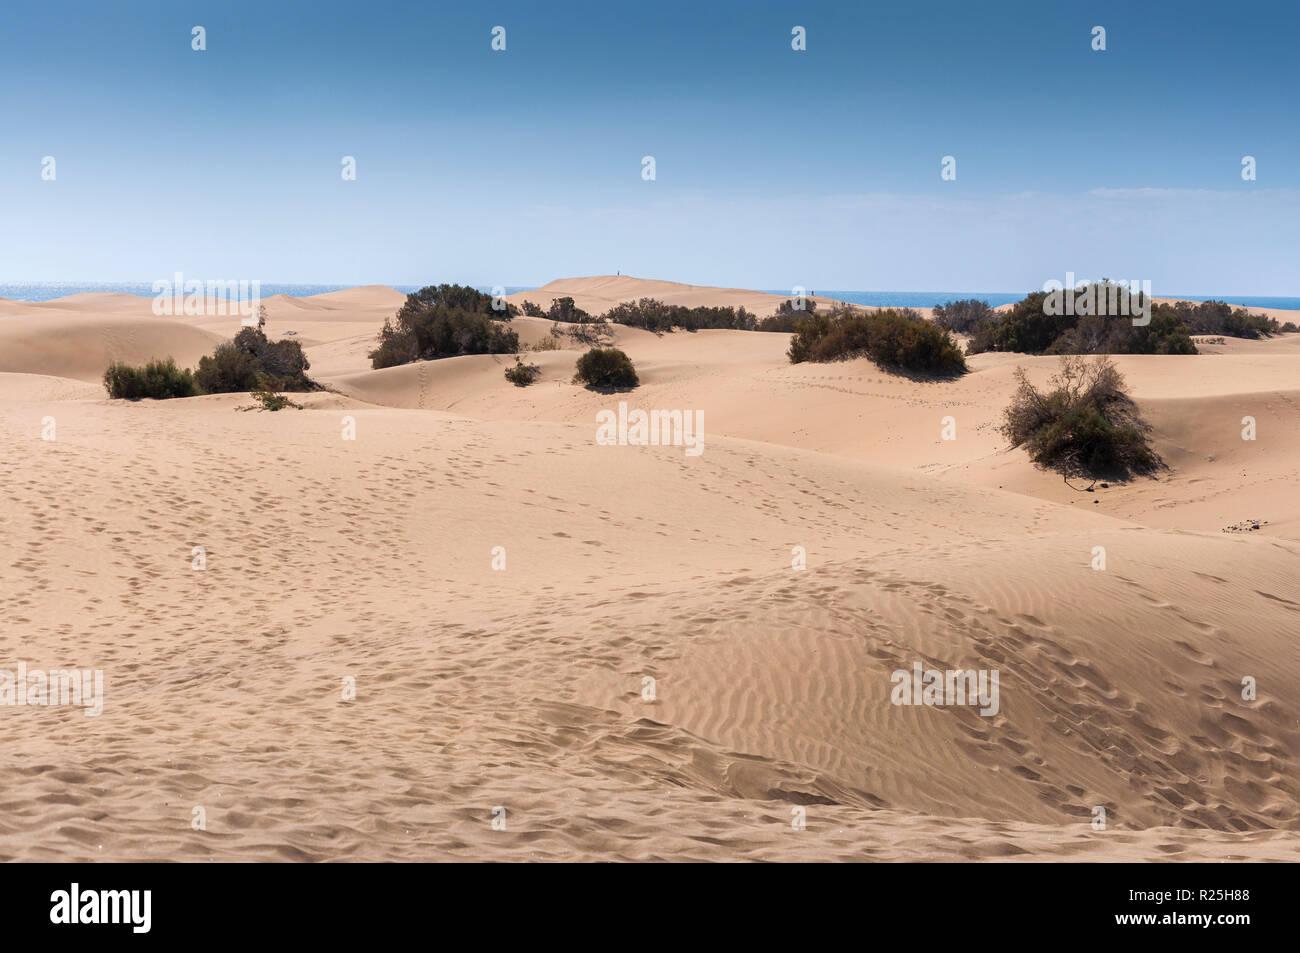 Coastal dunes in Maspalomas beach, Gran Canaria Island, Canary Islands, Spain. Stock Photo